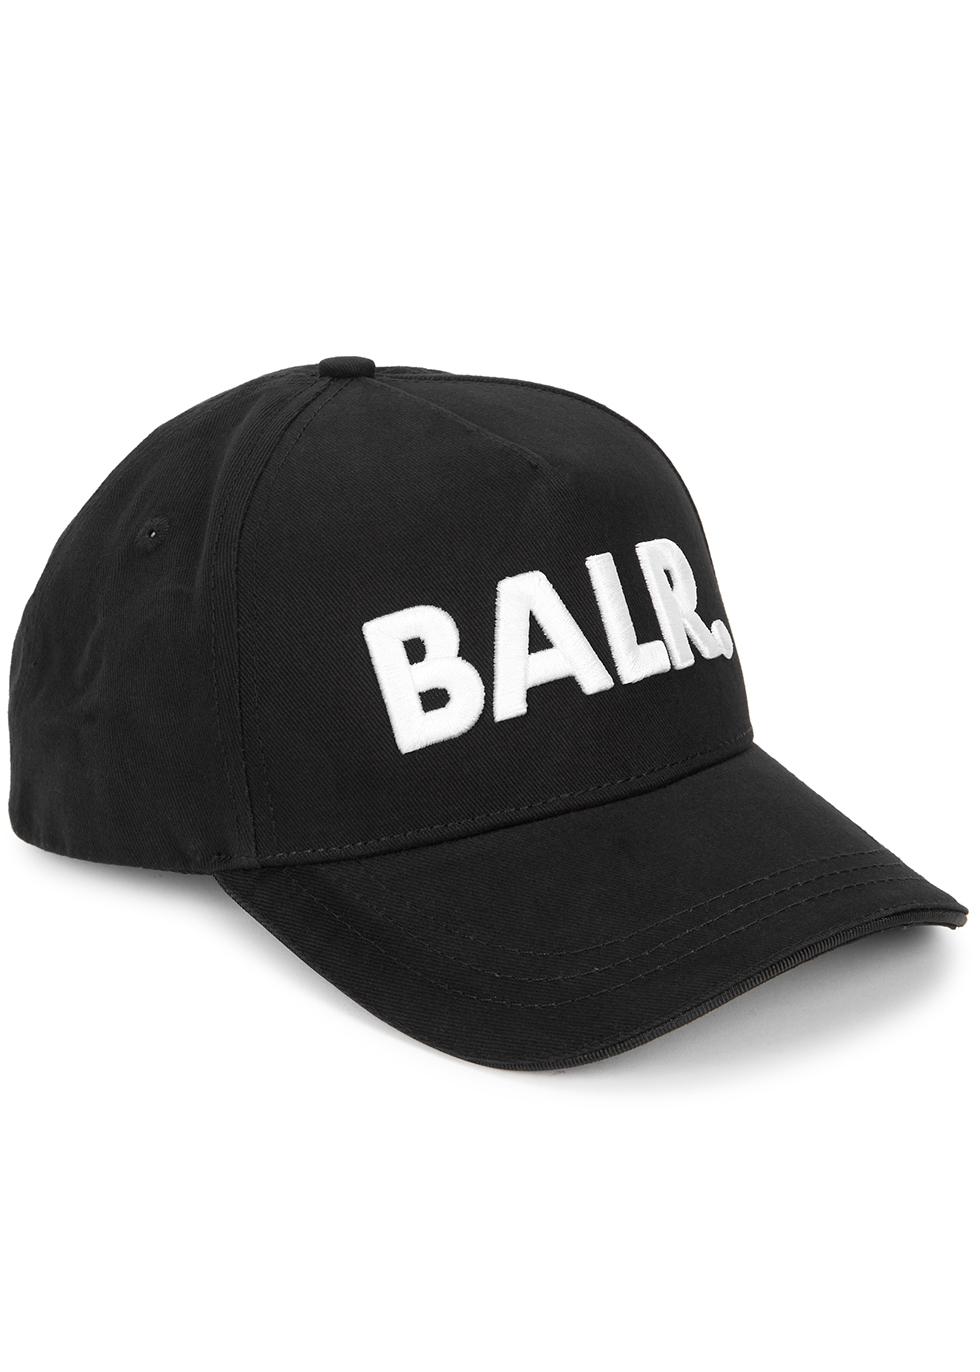 Black logo-embroidered cotton cap